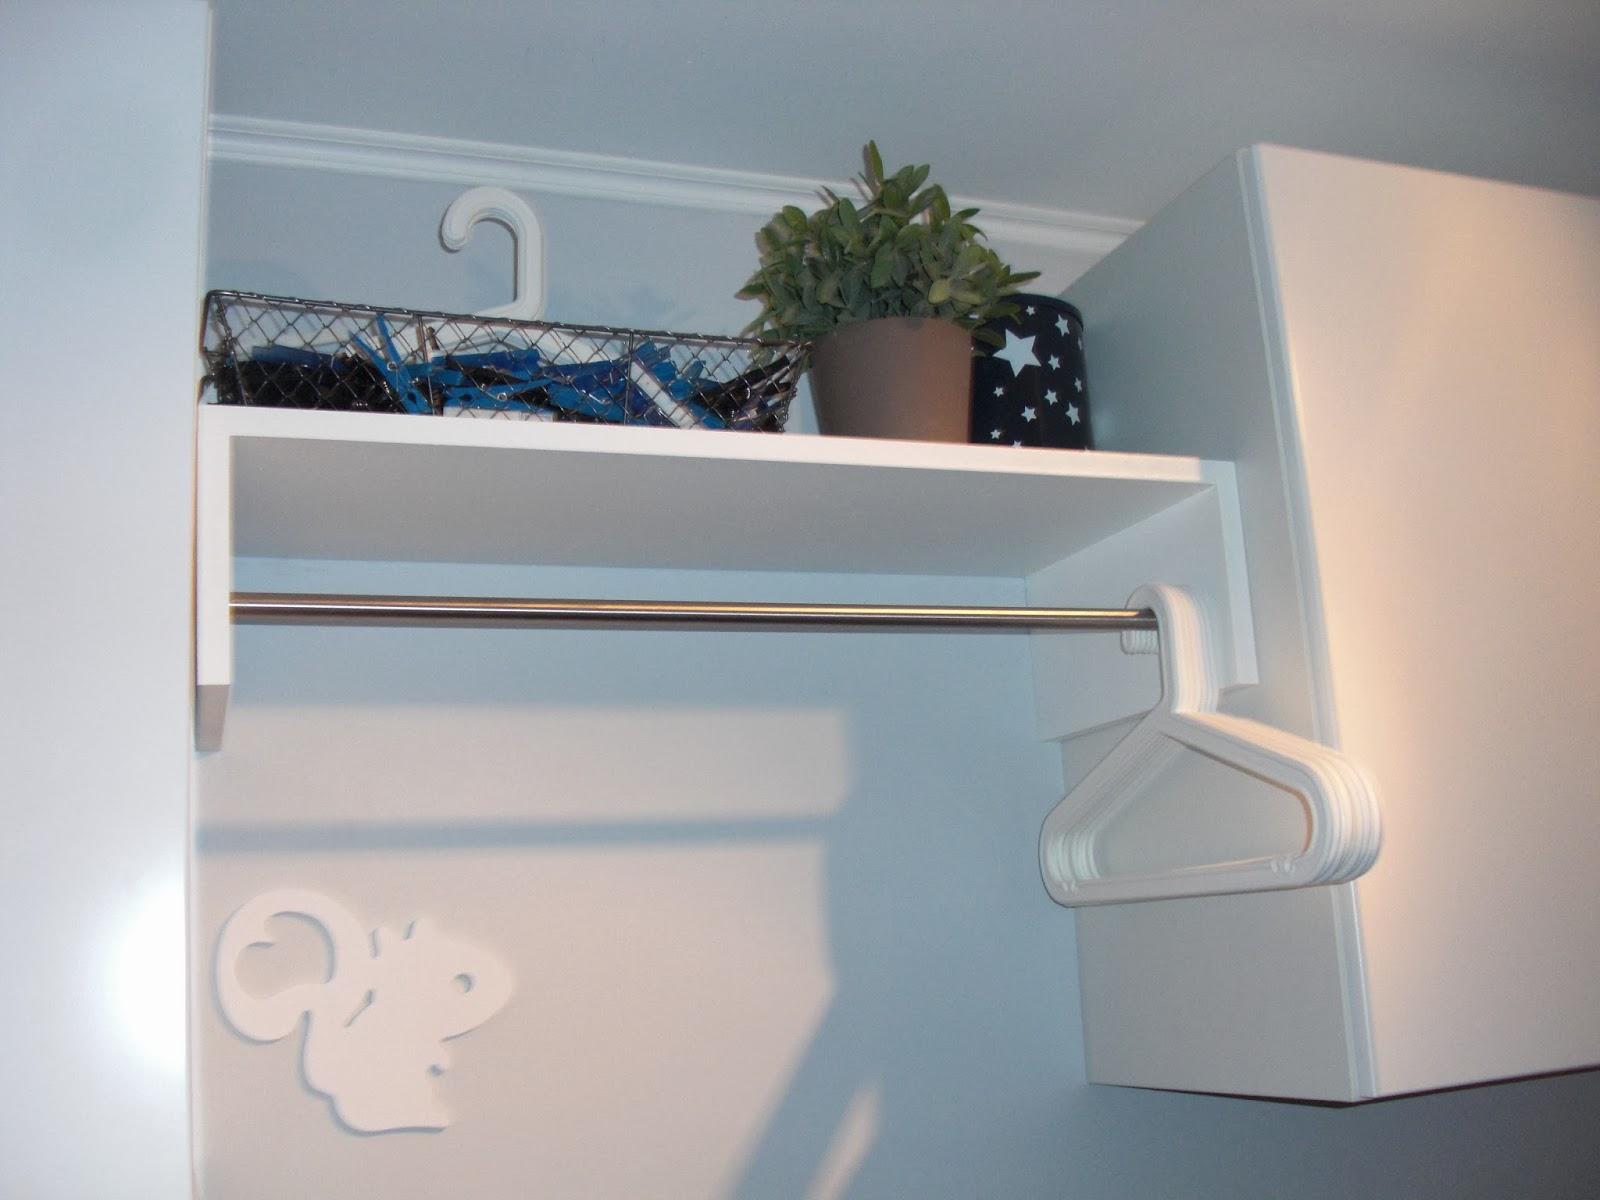 heim elich deko hwr regal. Black Bedroom Furniture Sets. Home Design Ideas